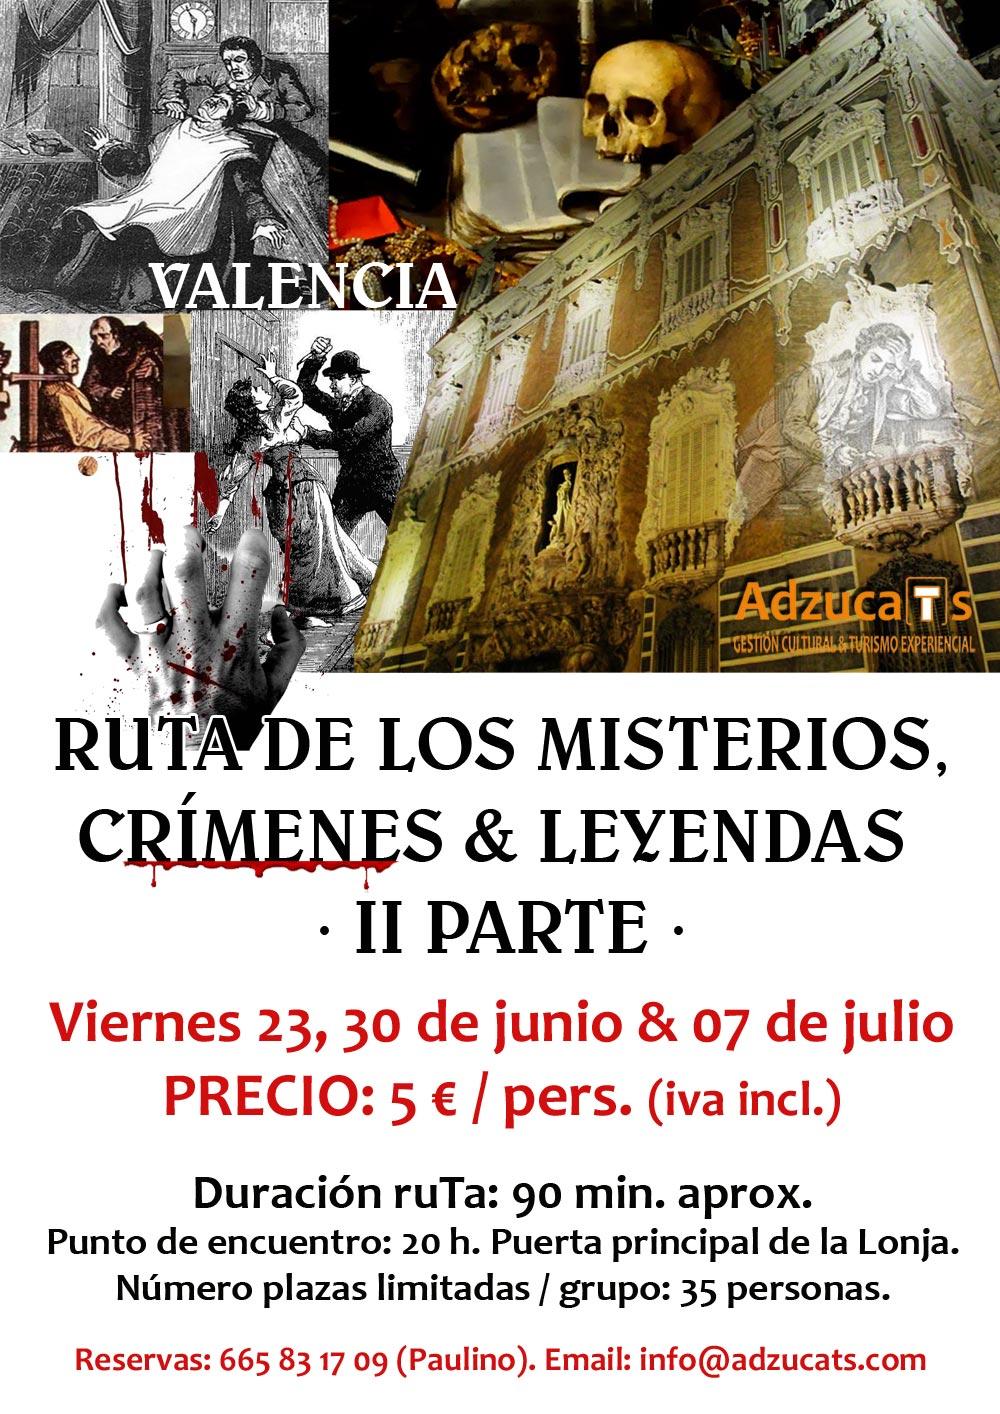 ruta misterios crimenes leyendas valencia rutas guiadas adzucats valencia